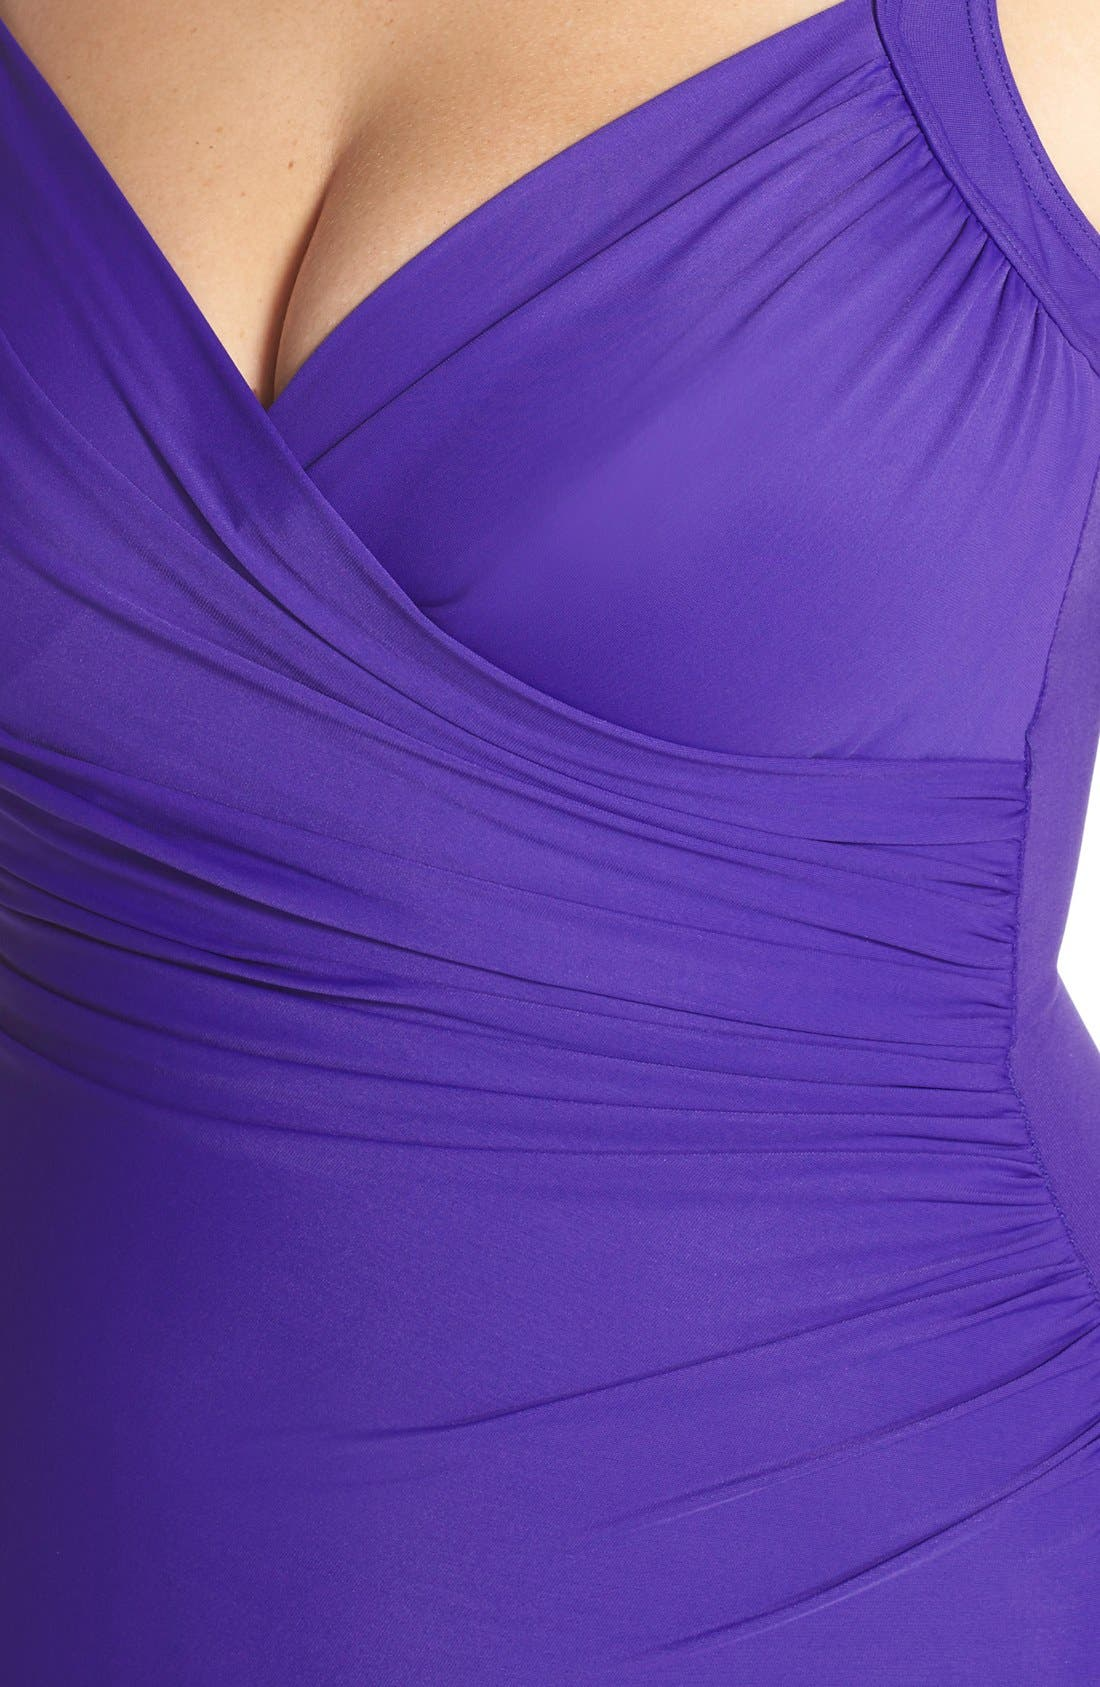 Alternate Image 4  - Miraclesuit® 'Sanibel' Underwire One-Piece Swimsuit (Plus Size)